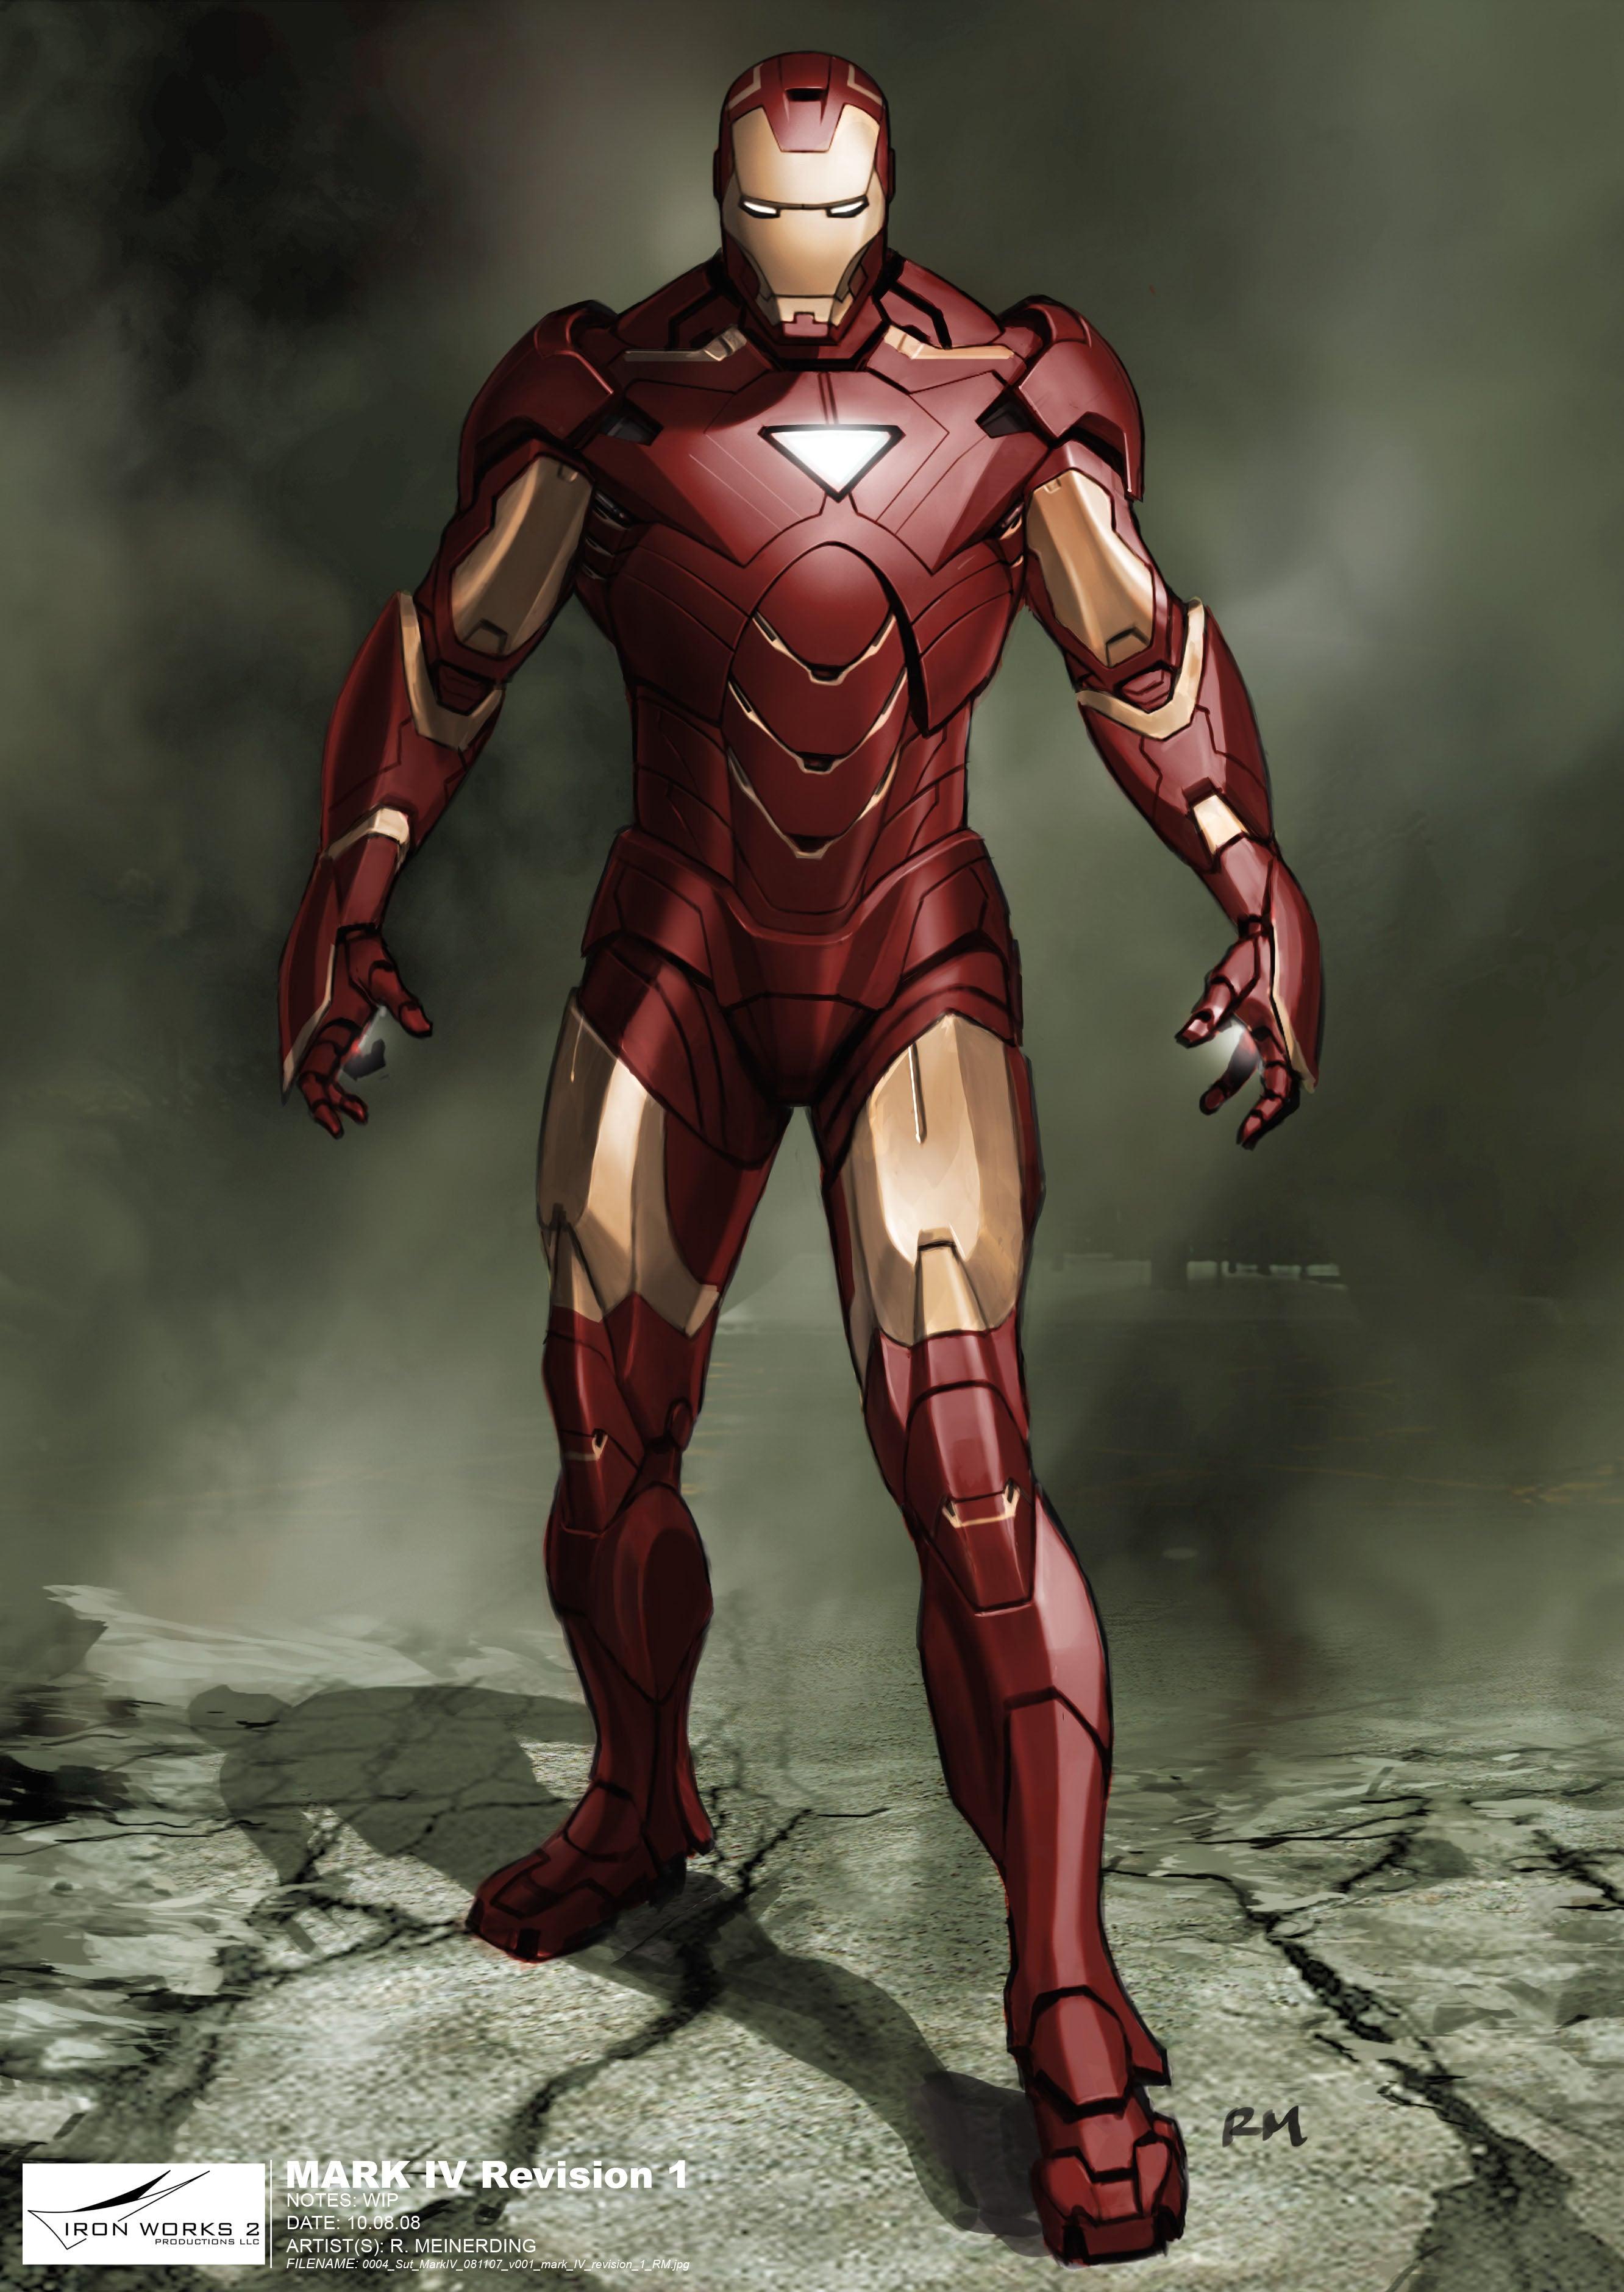 Design secrets of Iron Man 2: Suitcase armor, Whiplash and ...